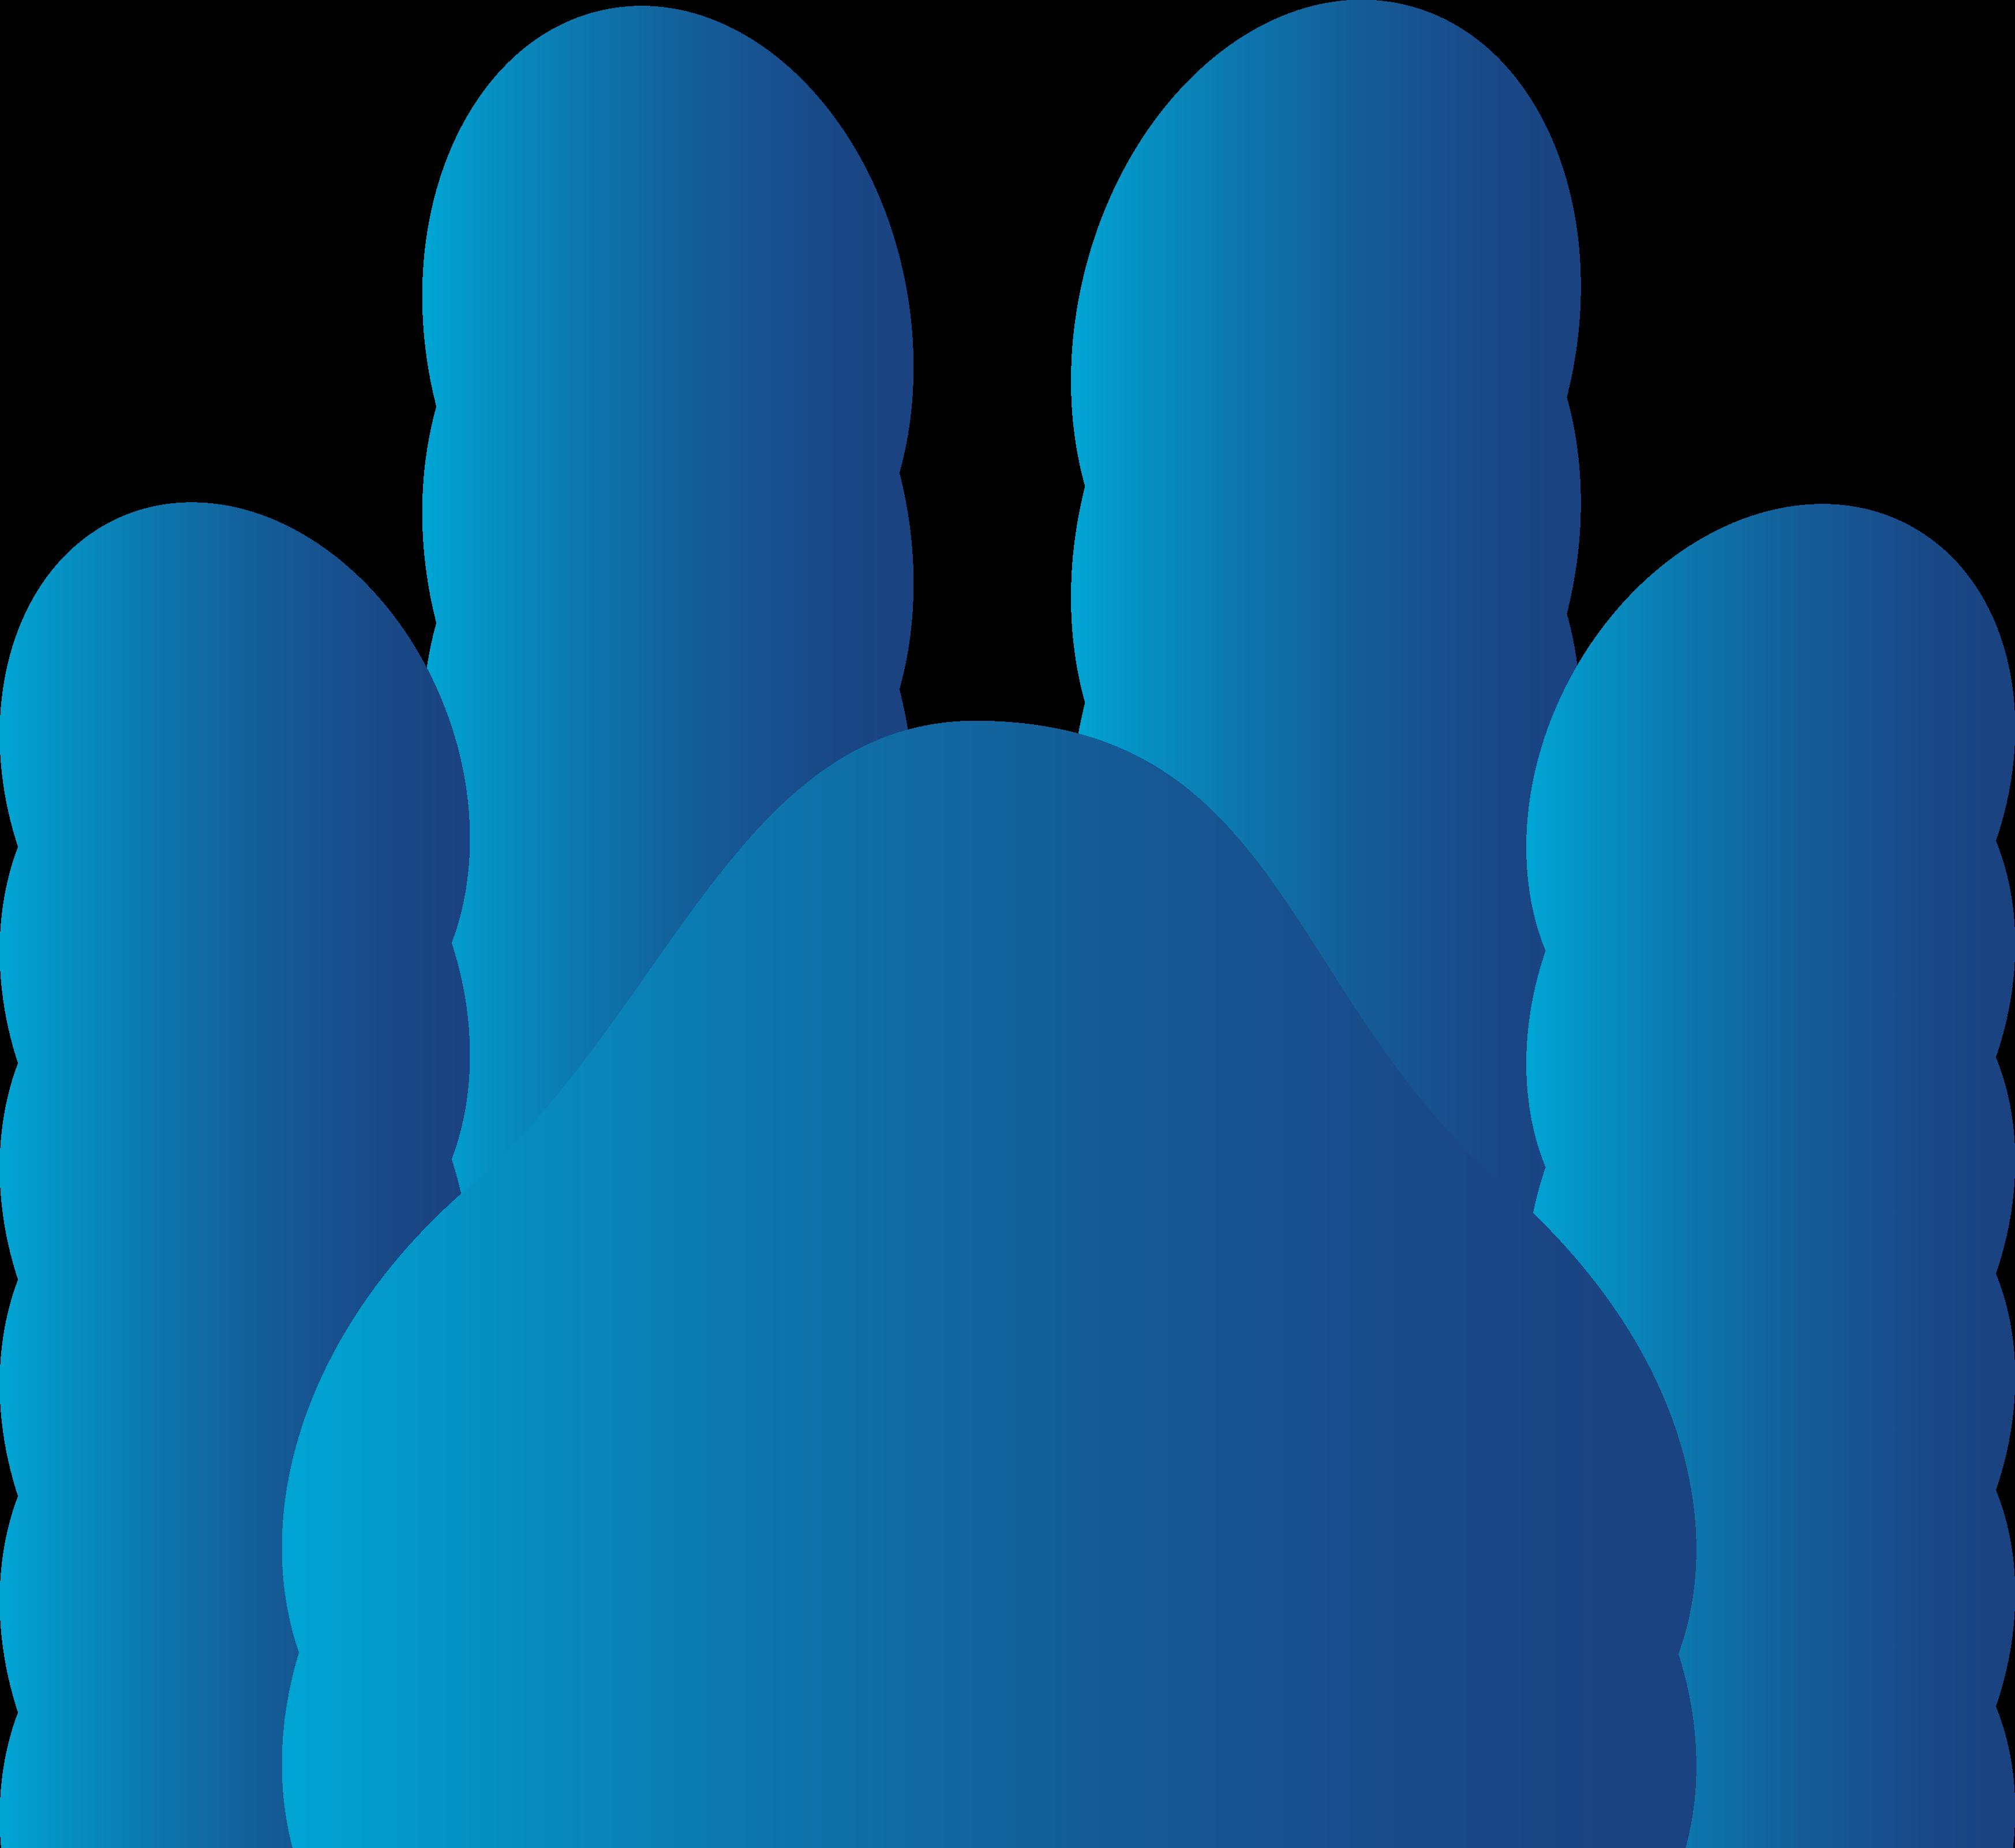 3492x3202 Dog Paw Print Clip Art